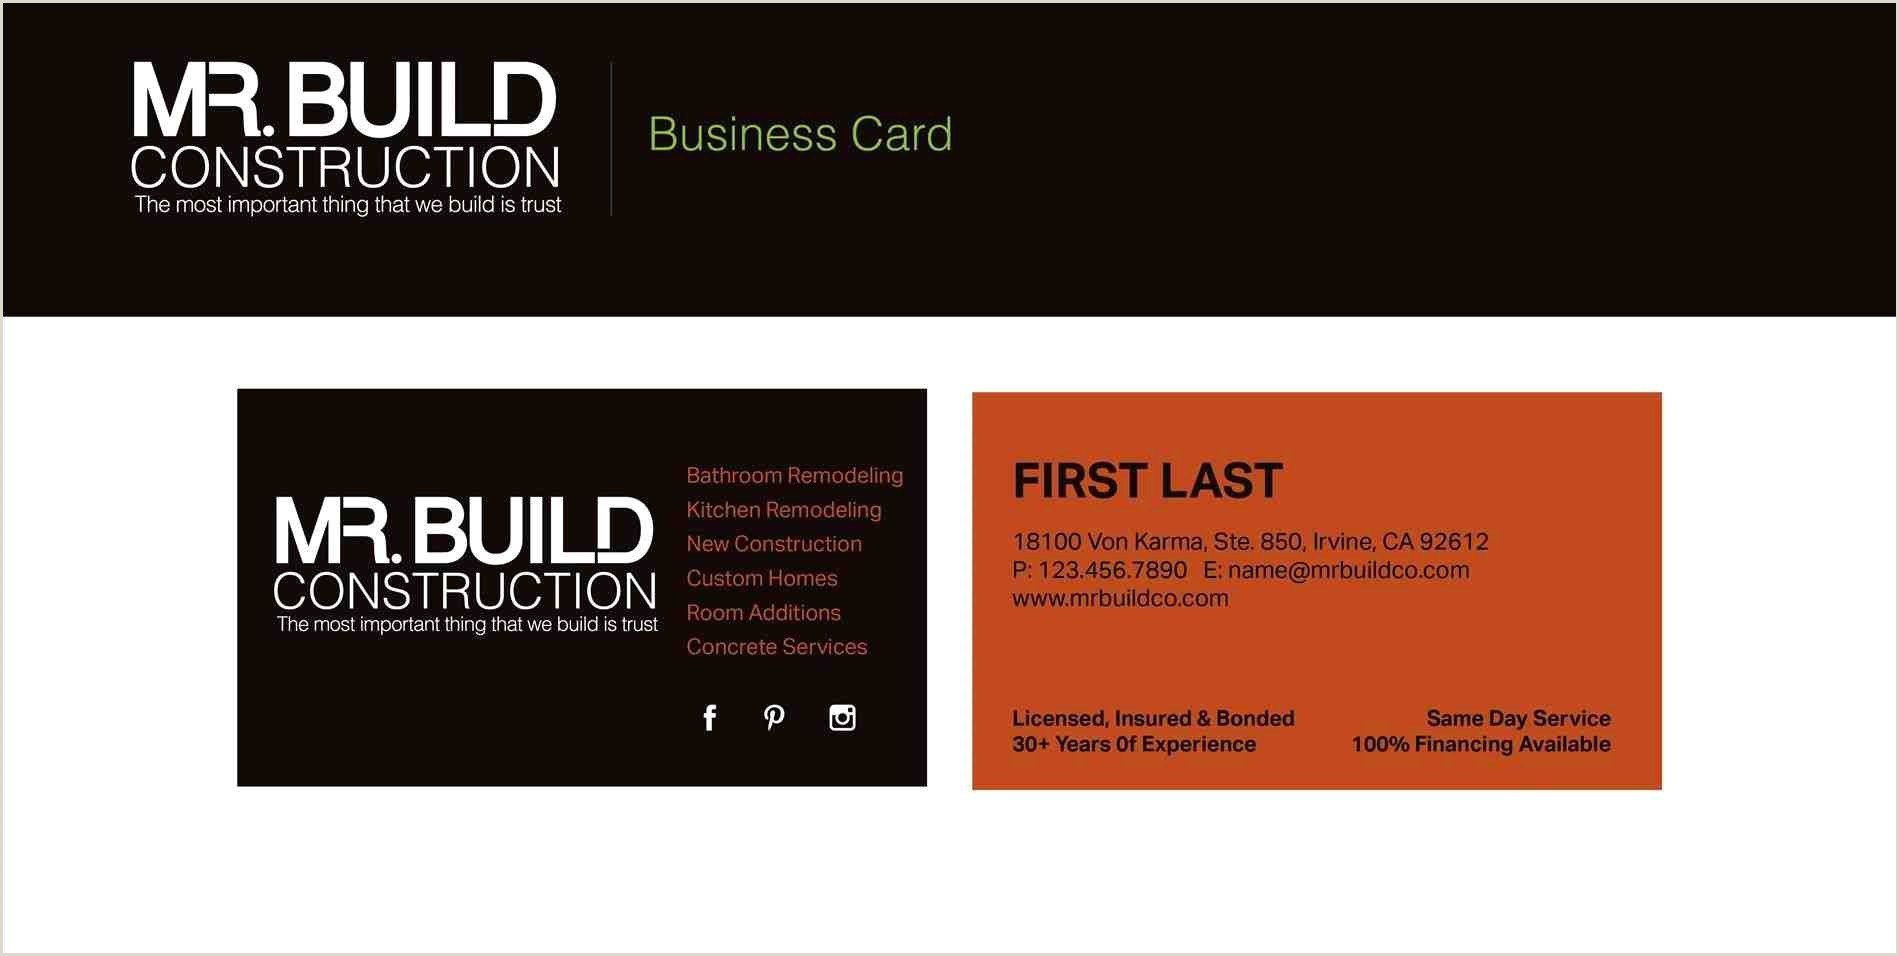 Best Business Cards For Remodeling 14 Popular Hardwood Flooring Business Card Template